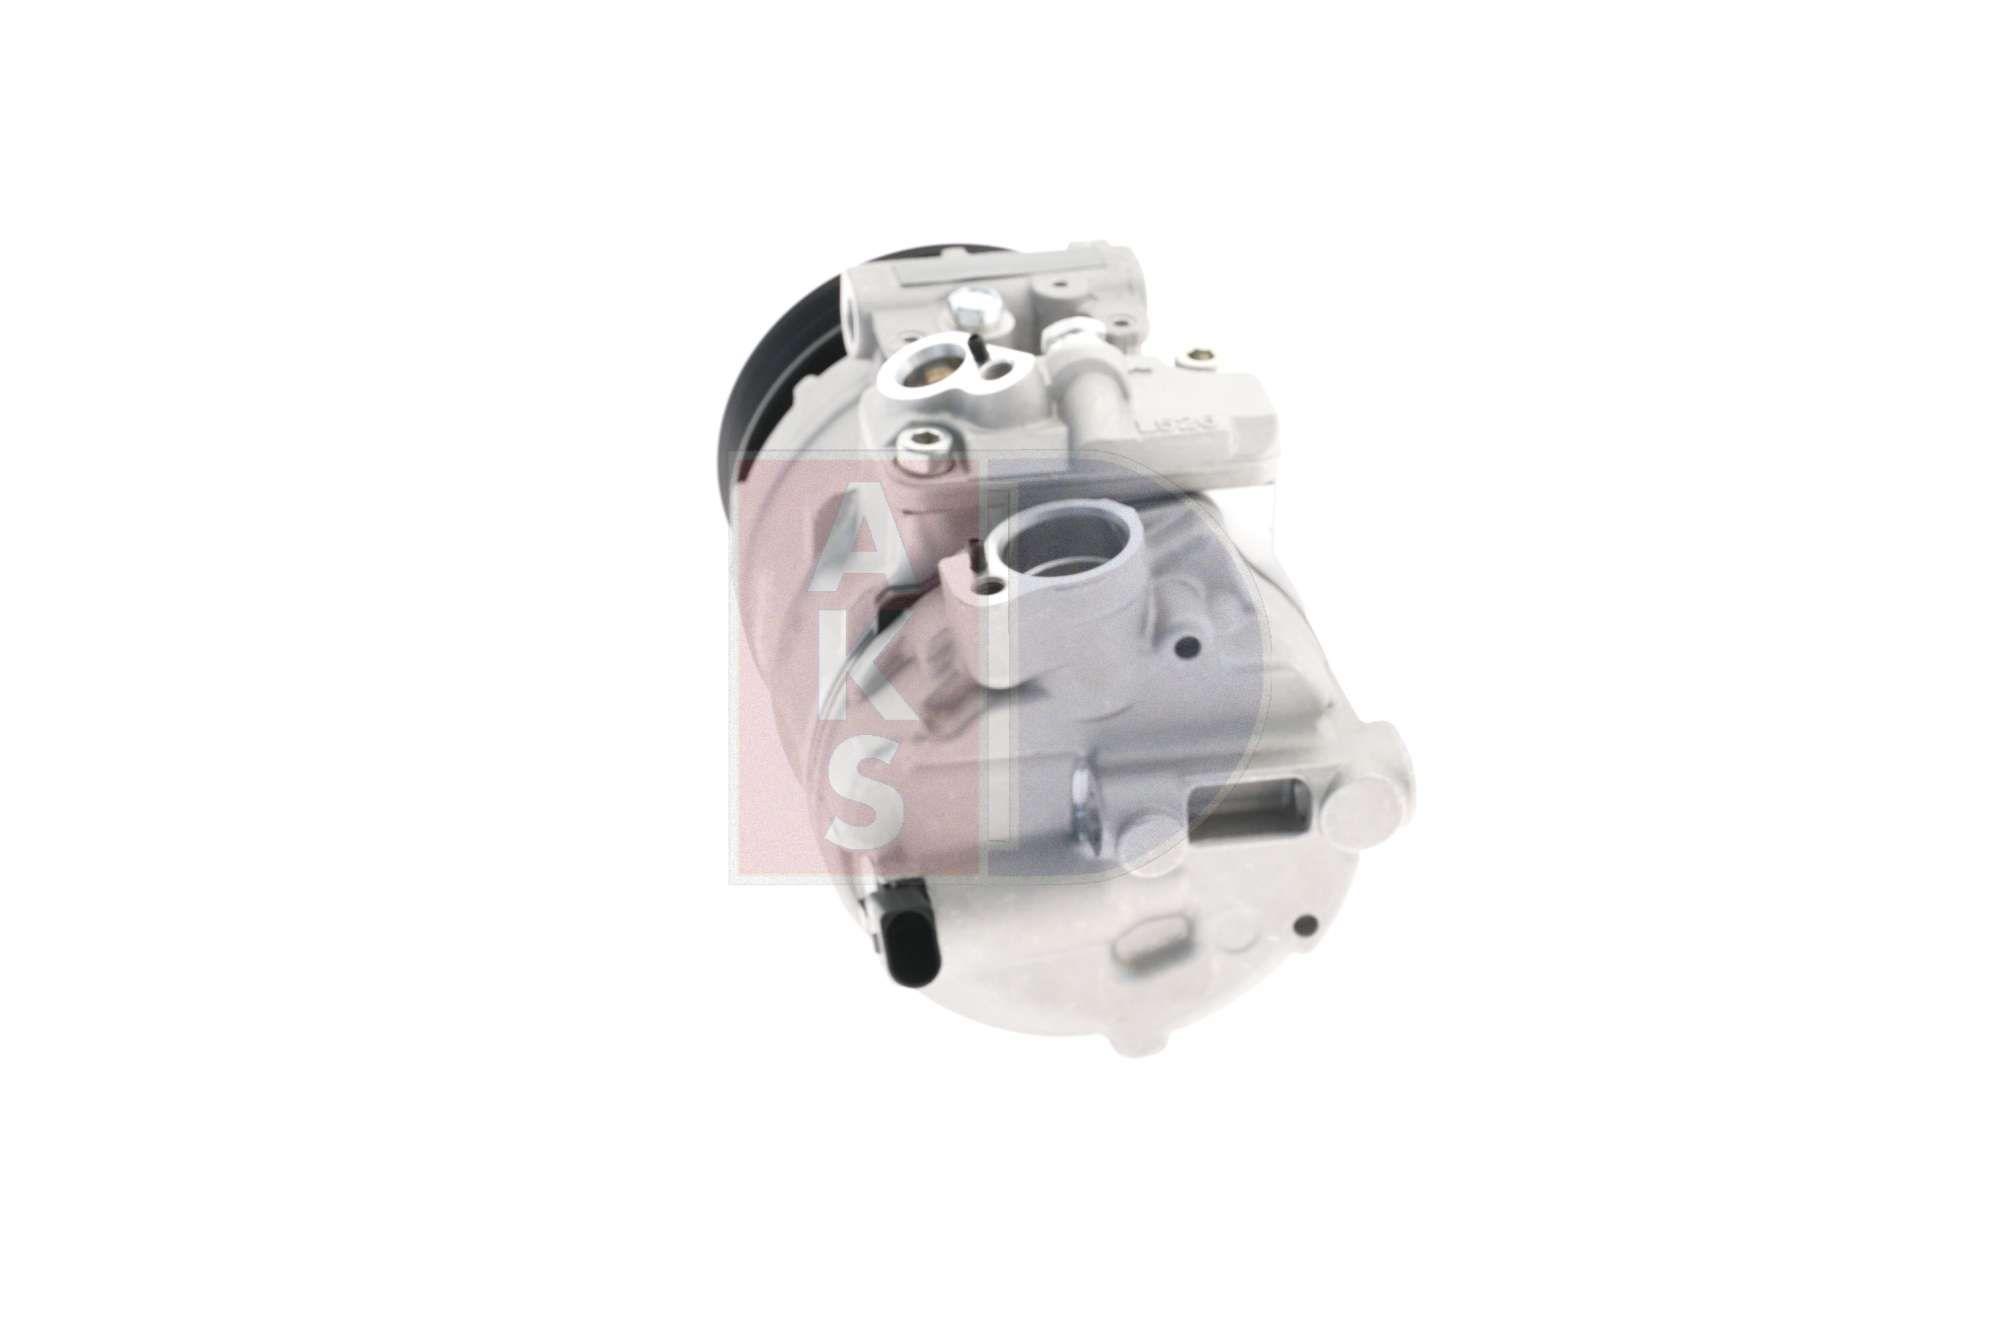 Kältemittelkompressor AKS DASIS 850682N Erfahrung